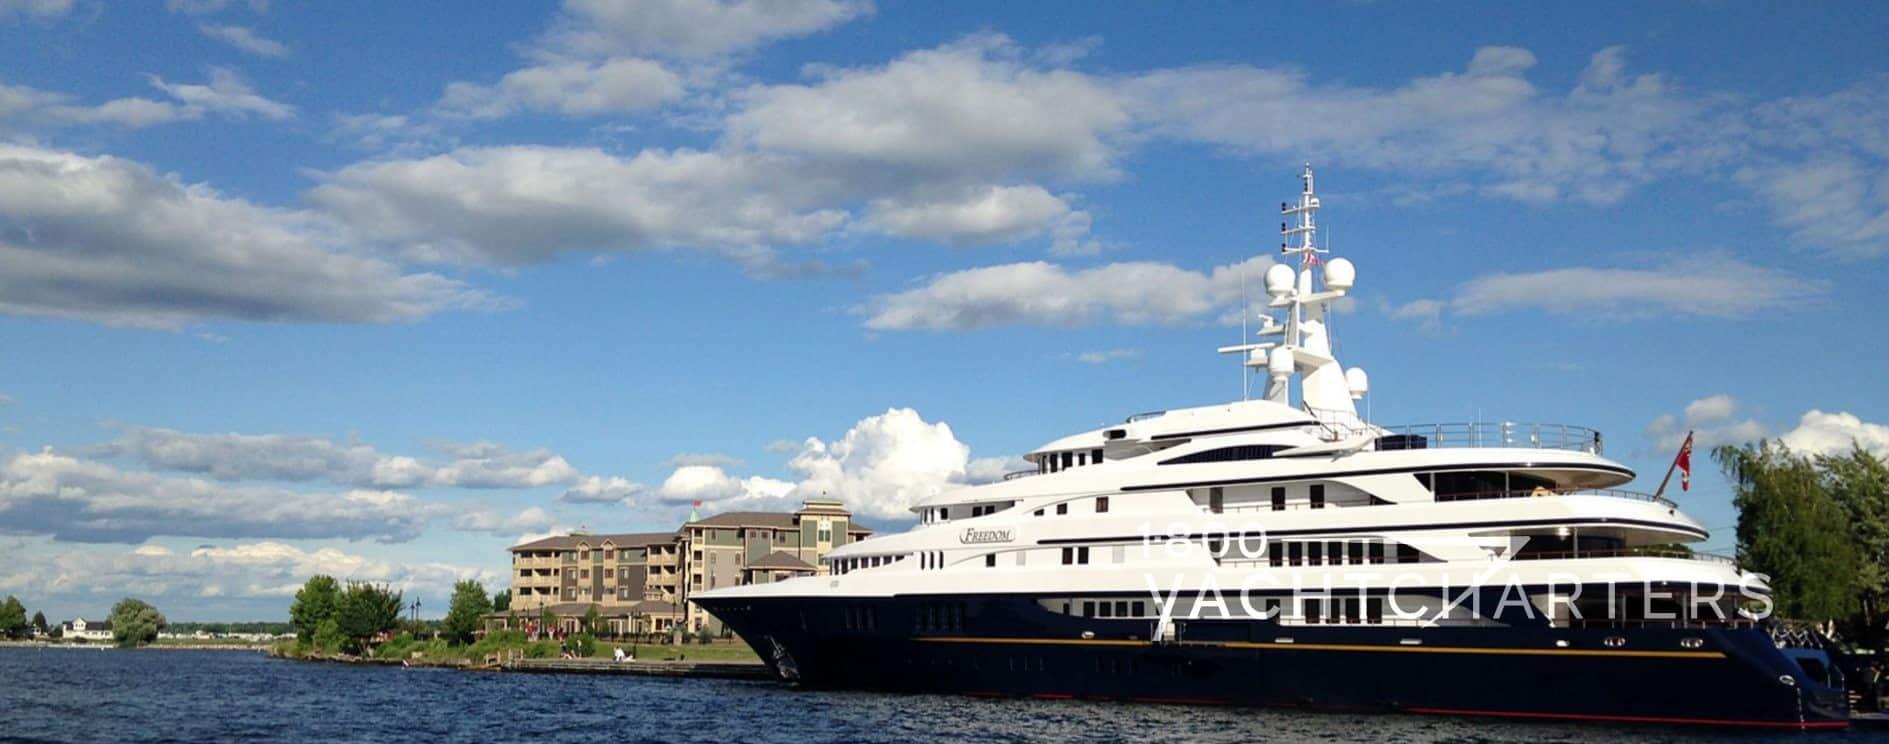 Benetti superyacht Freedom in Clayton New York The Thousand Islands near Canada